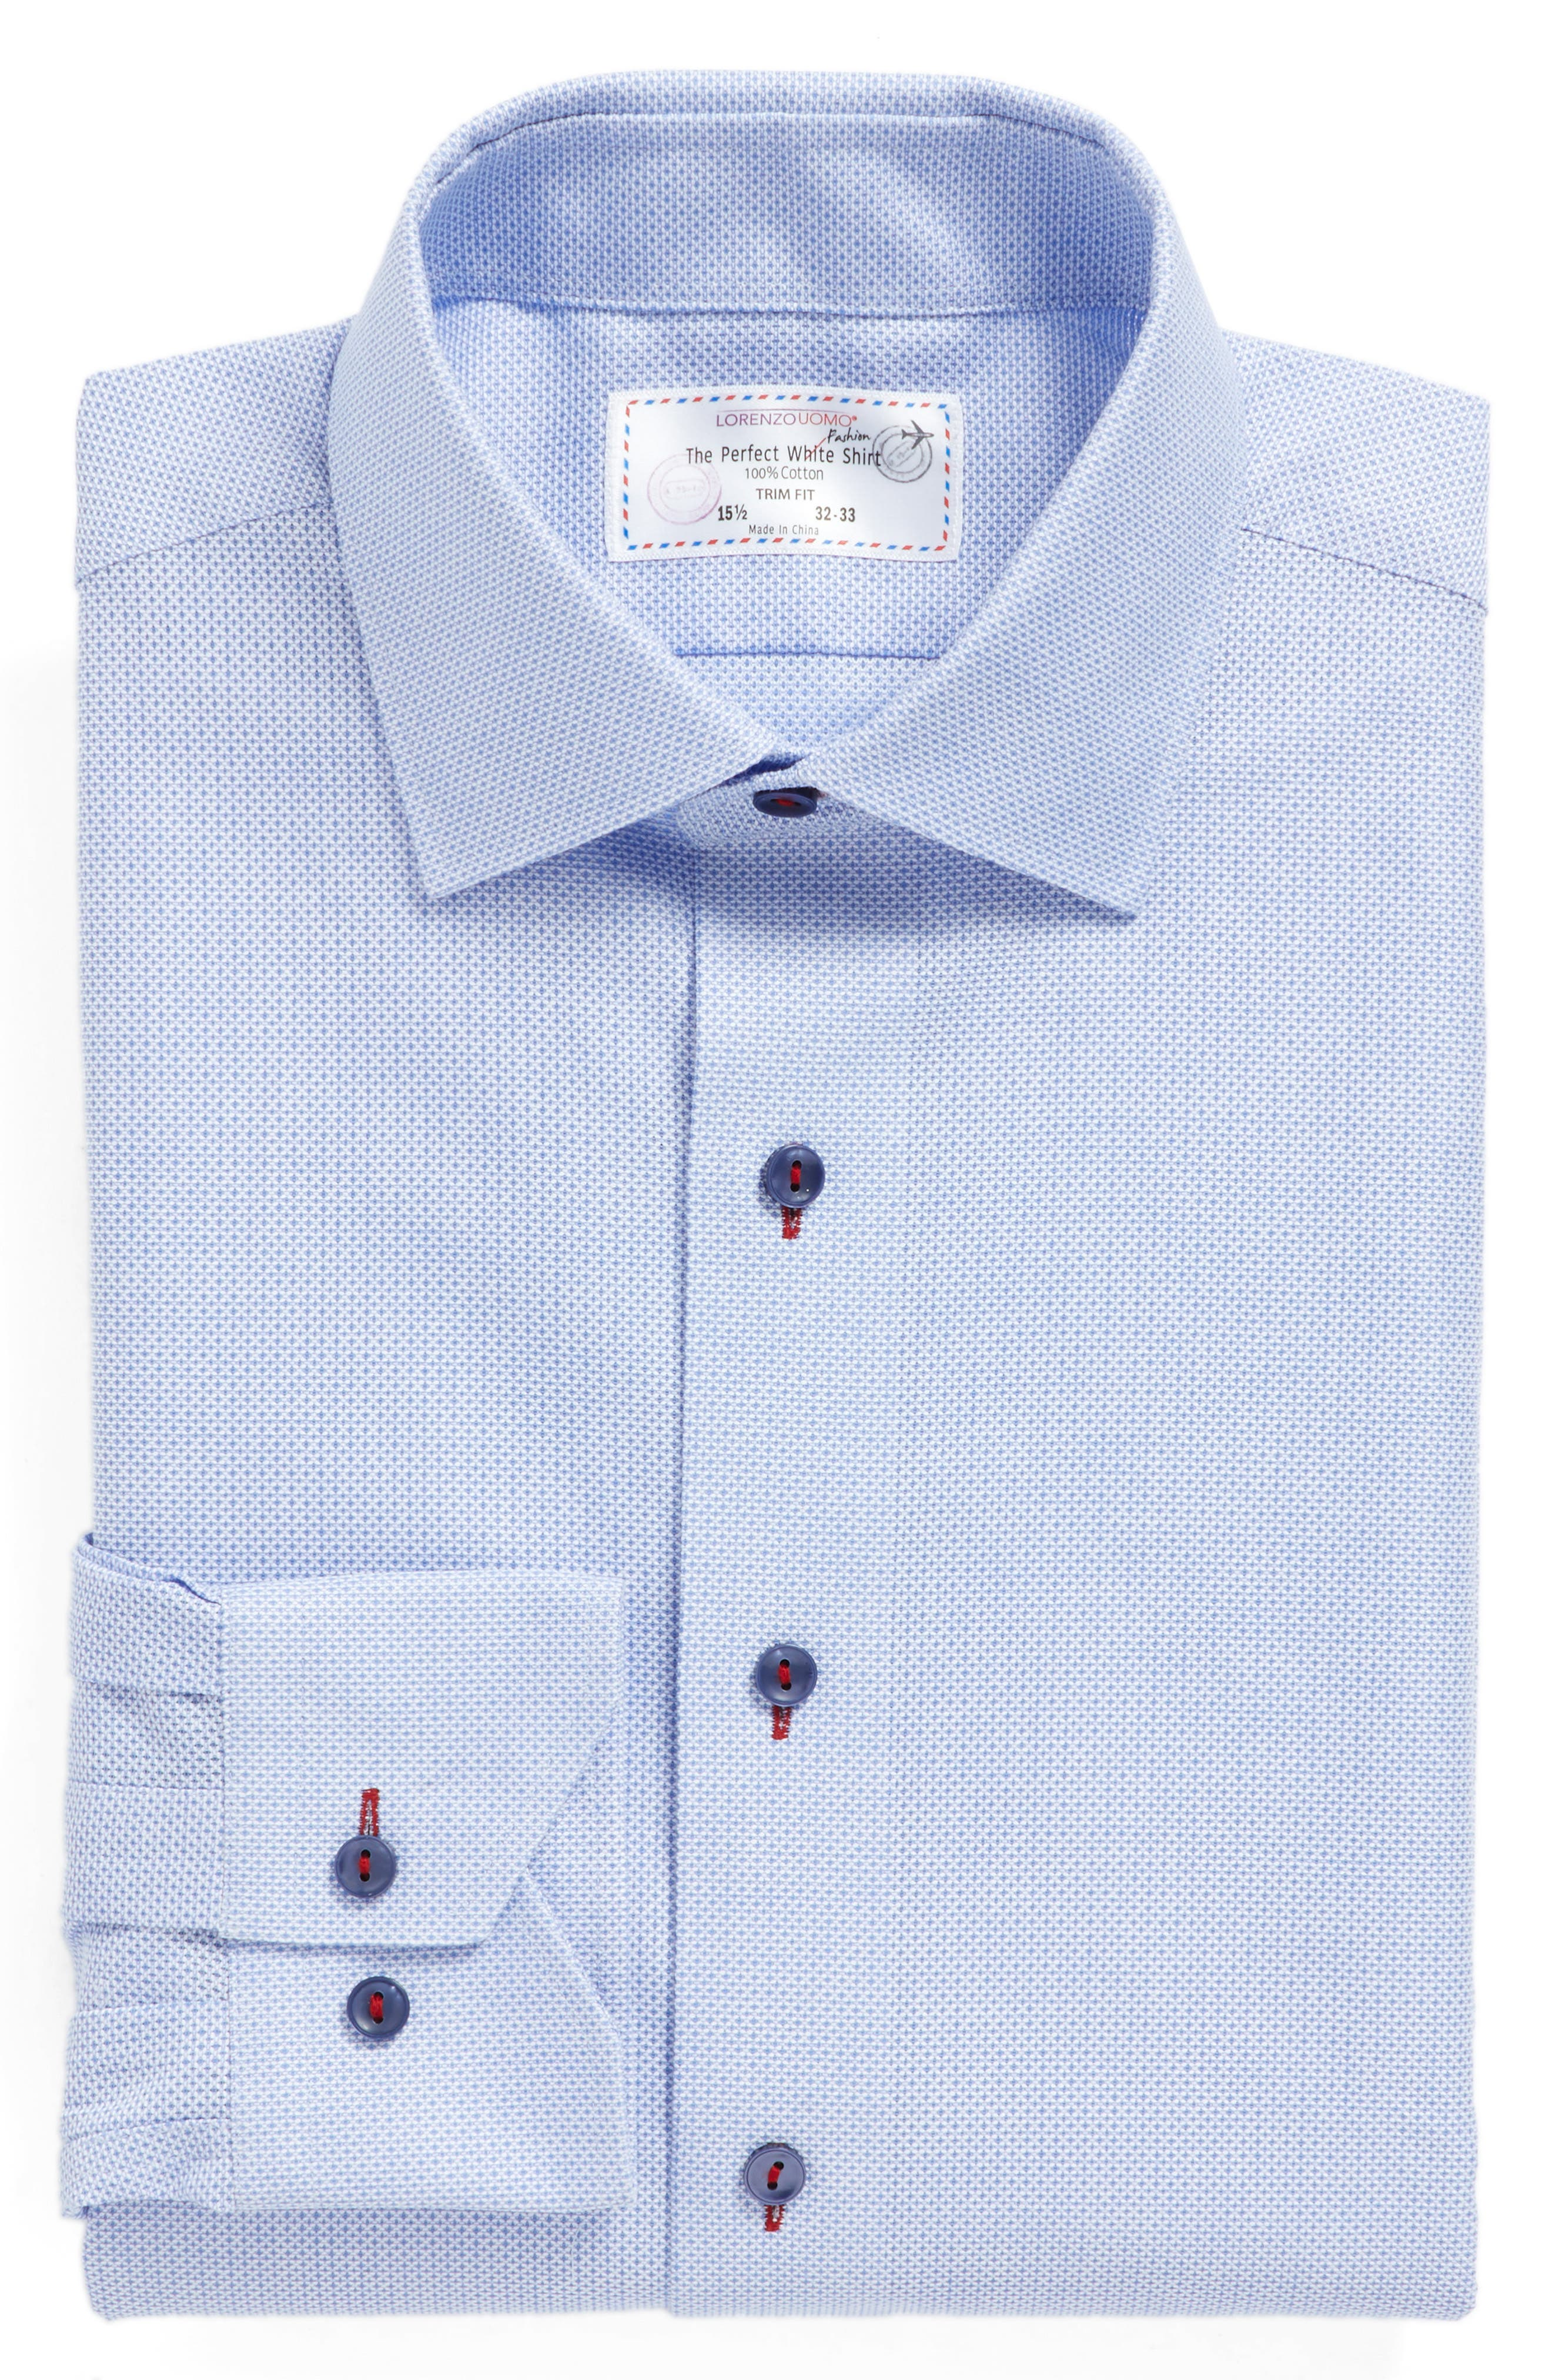 LORENZO UOMO Trim Fit Geometric Dress Shirt